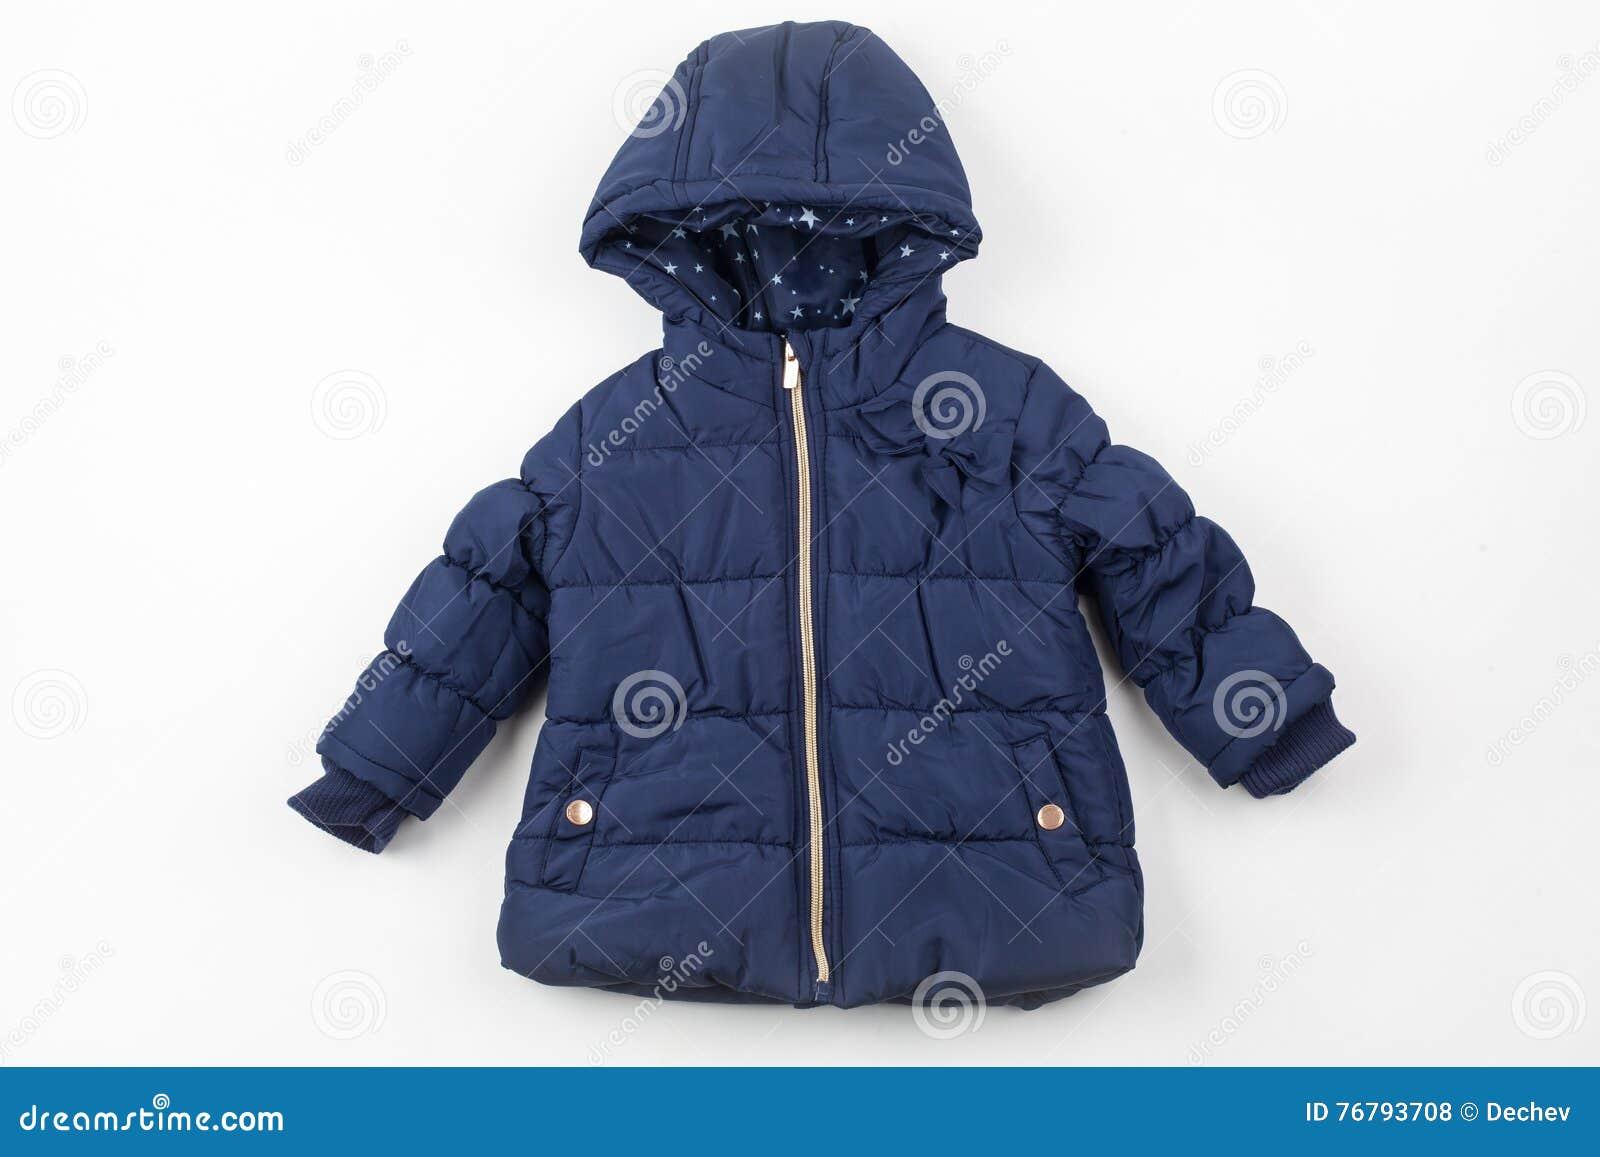 7860fcd95 Blue Children Winter Jacket Stock Photo - Image of elegance ...